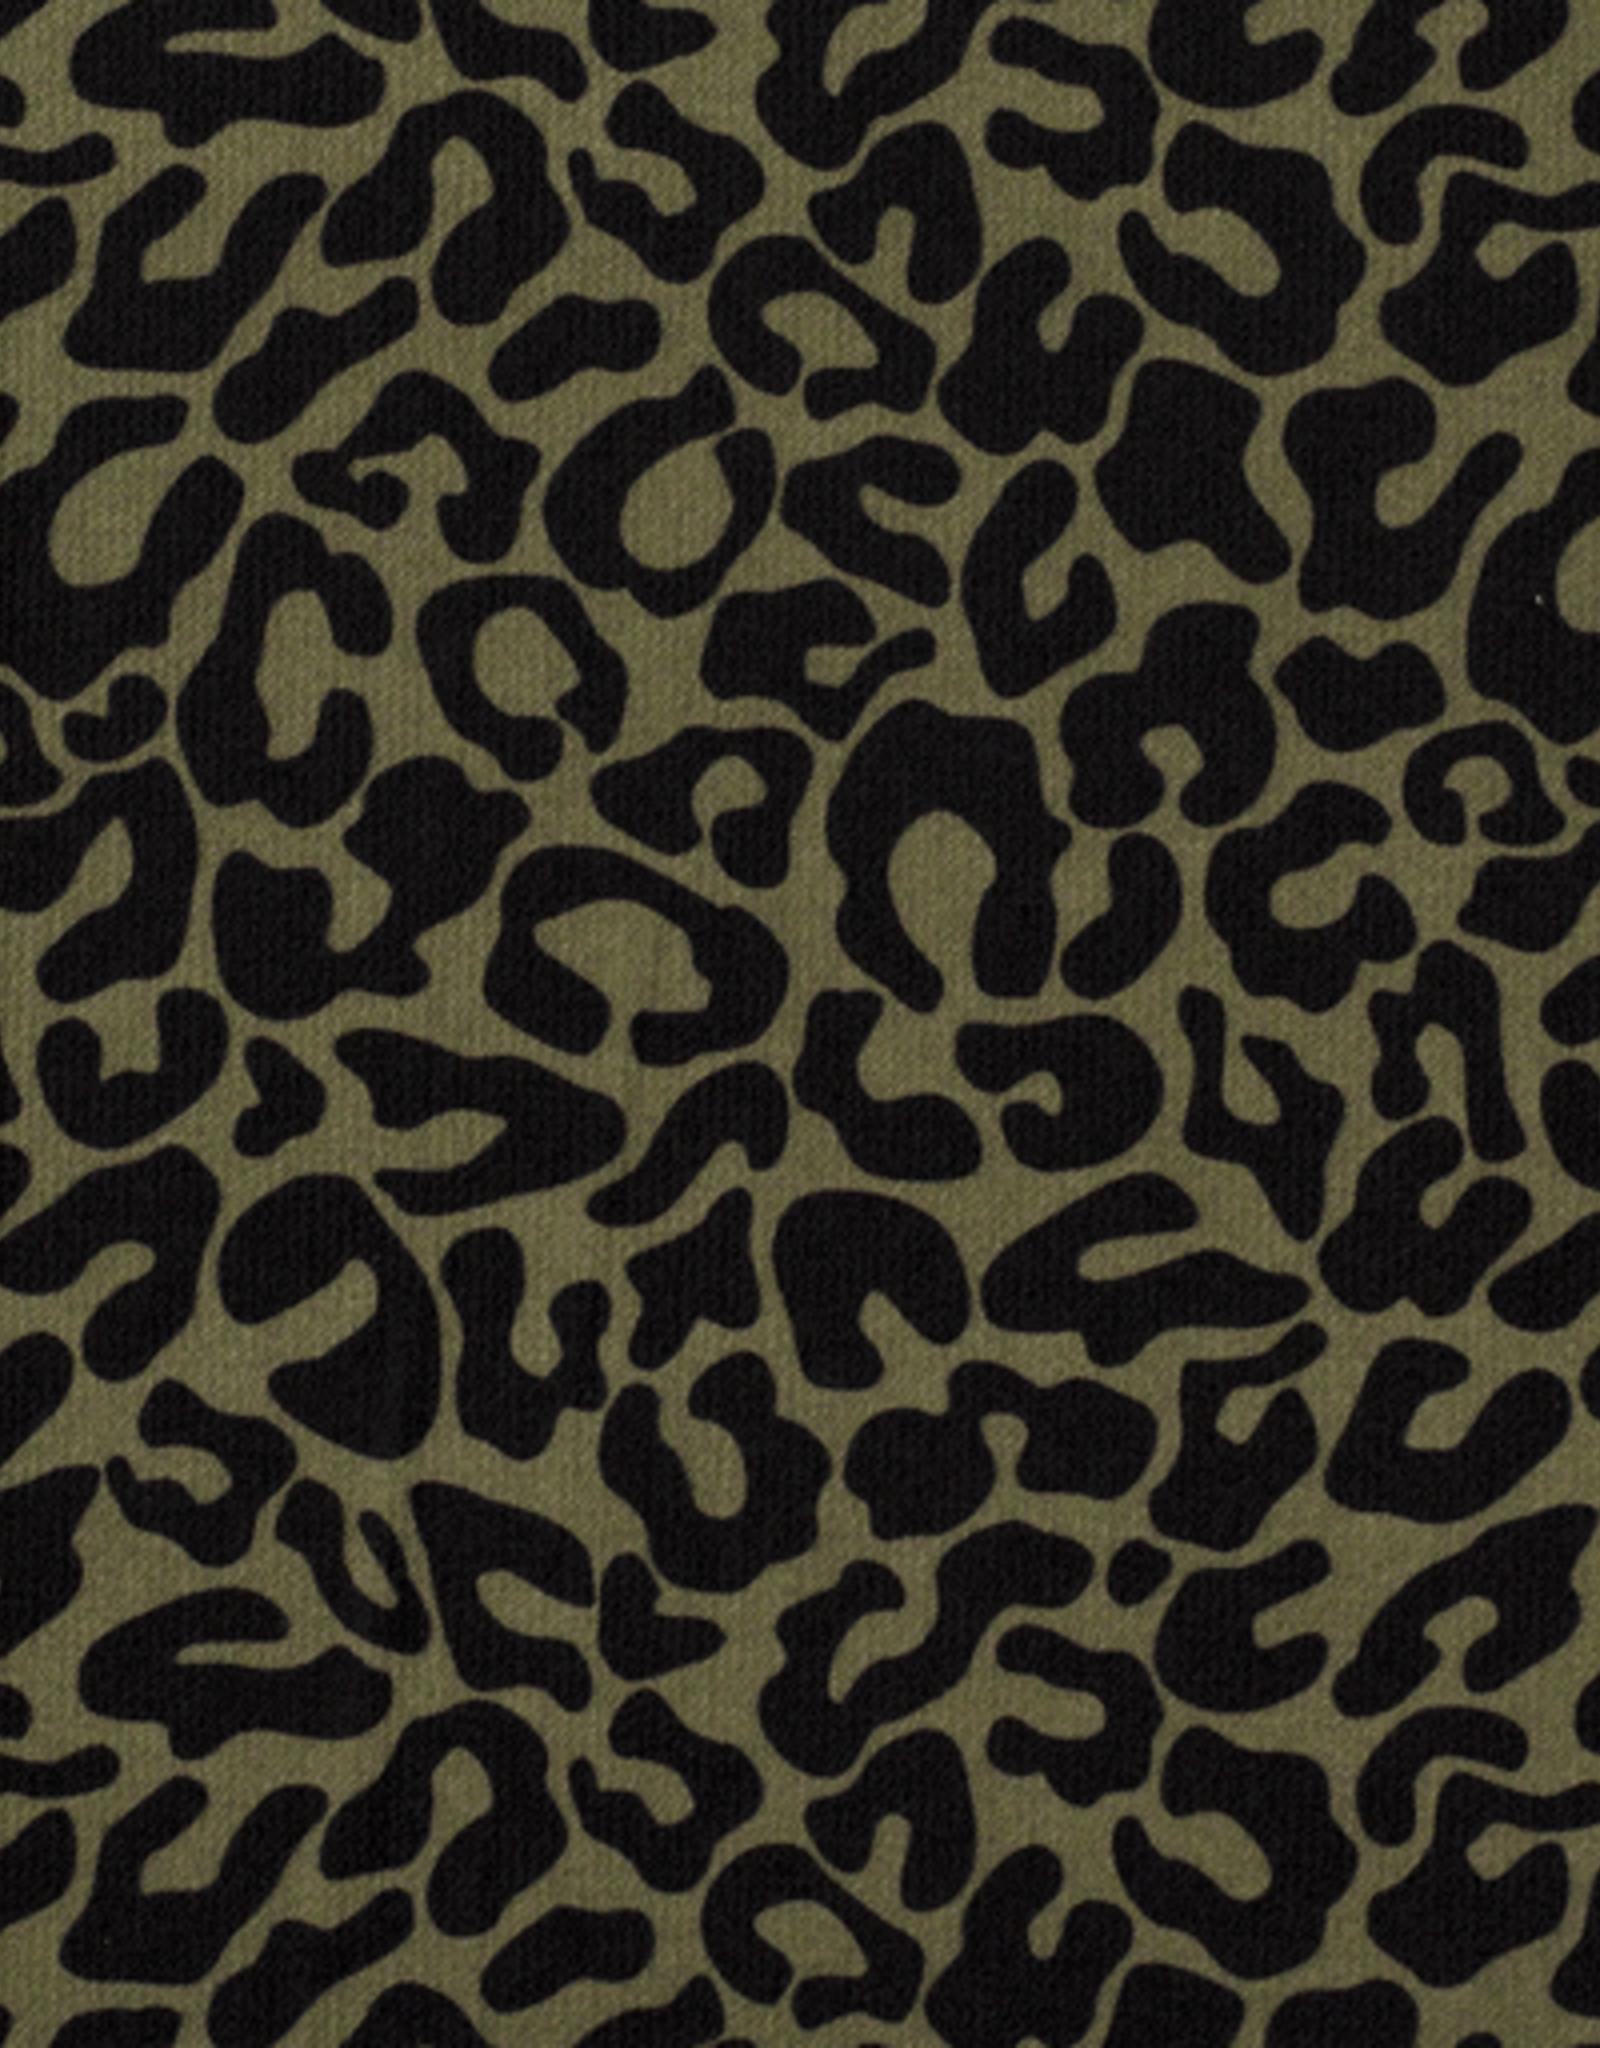 Bubble chiffon luipaardprint kaki